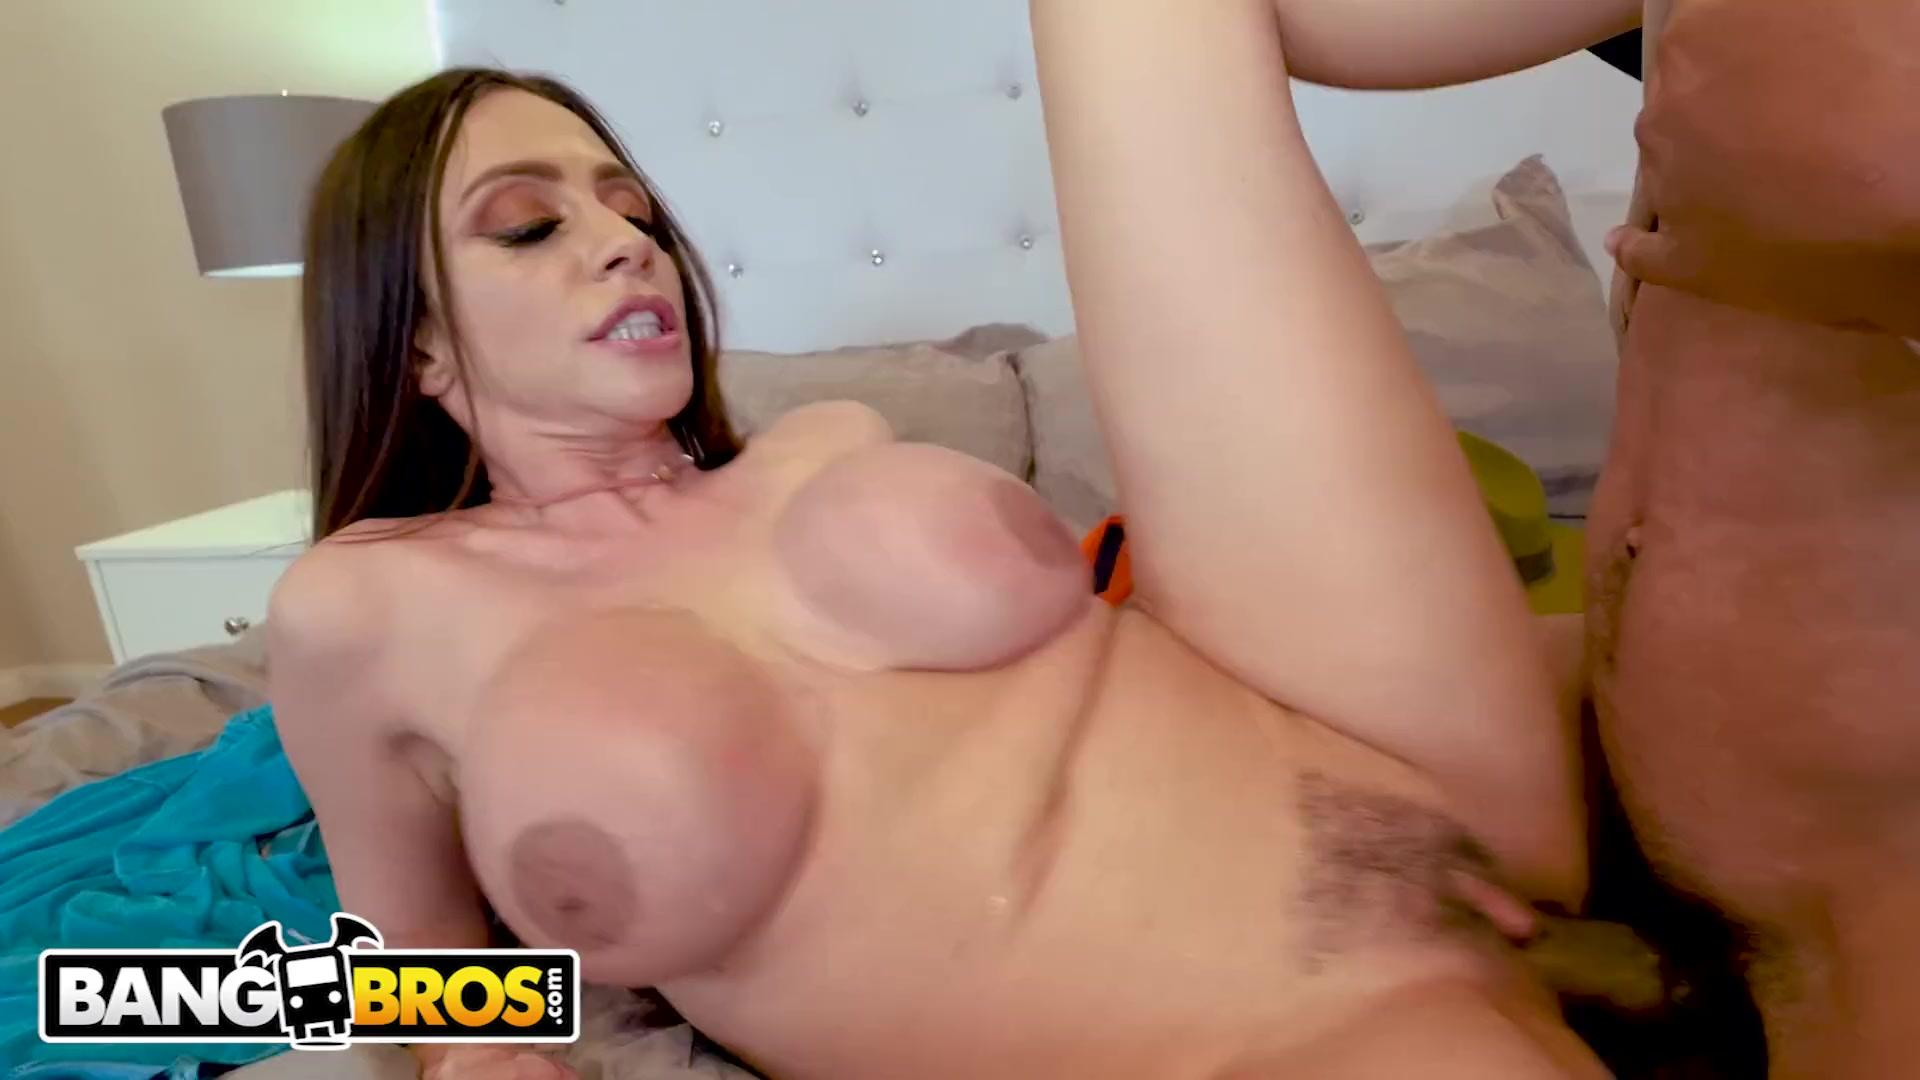 Free huge white dick porn